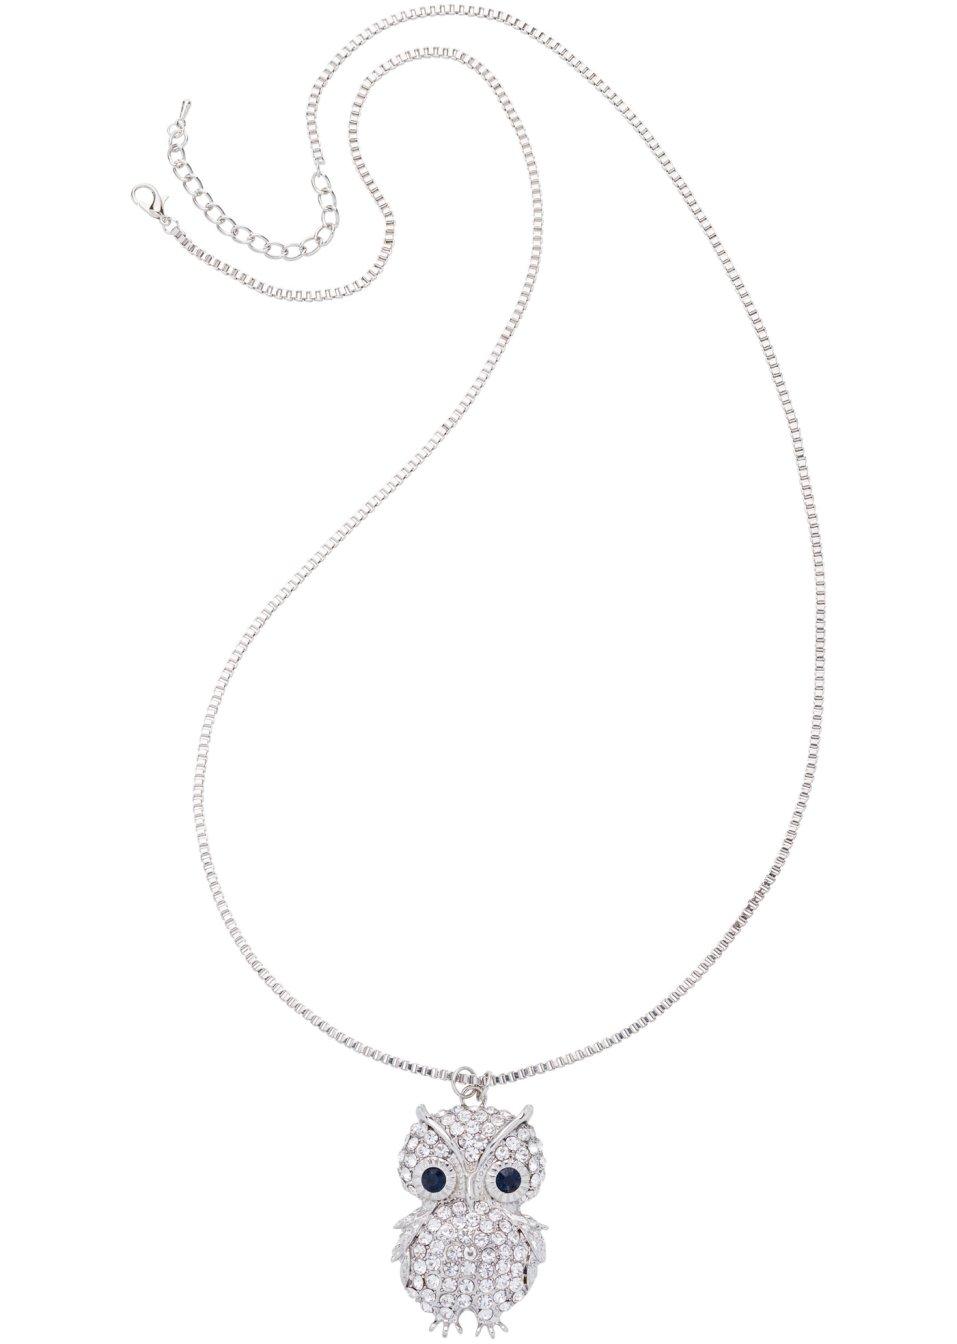 Halsband Uggla silverfärgad blå - bpc bonprix collection beställa online -  bonprix.se 6cd6eb7435791